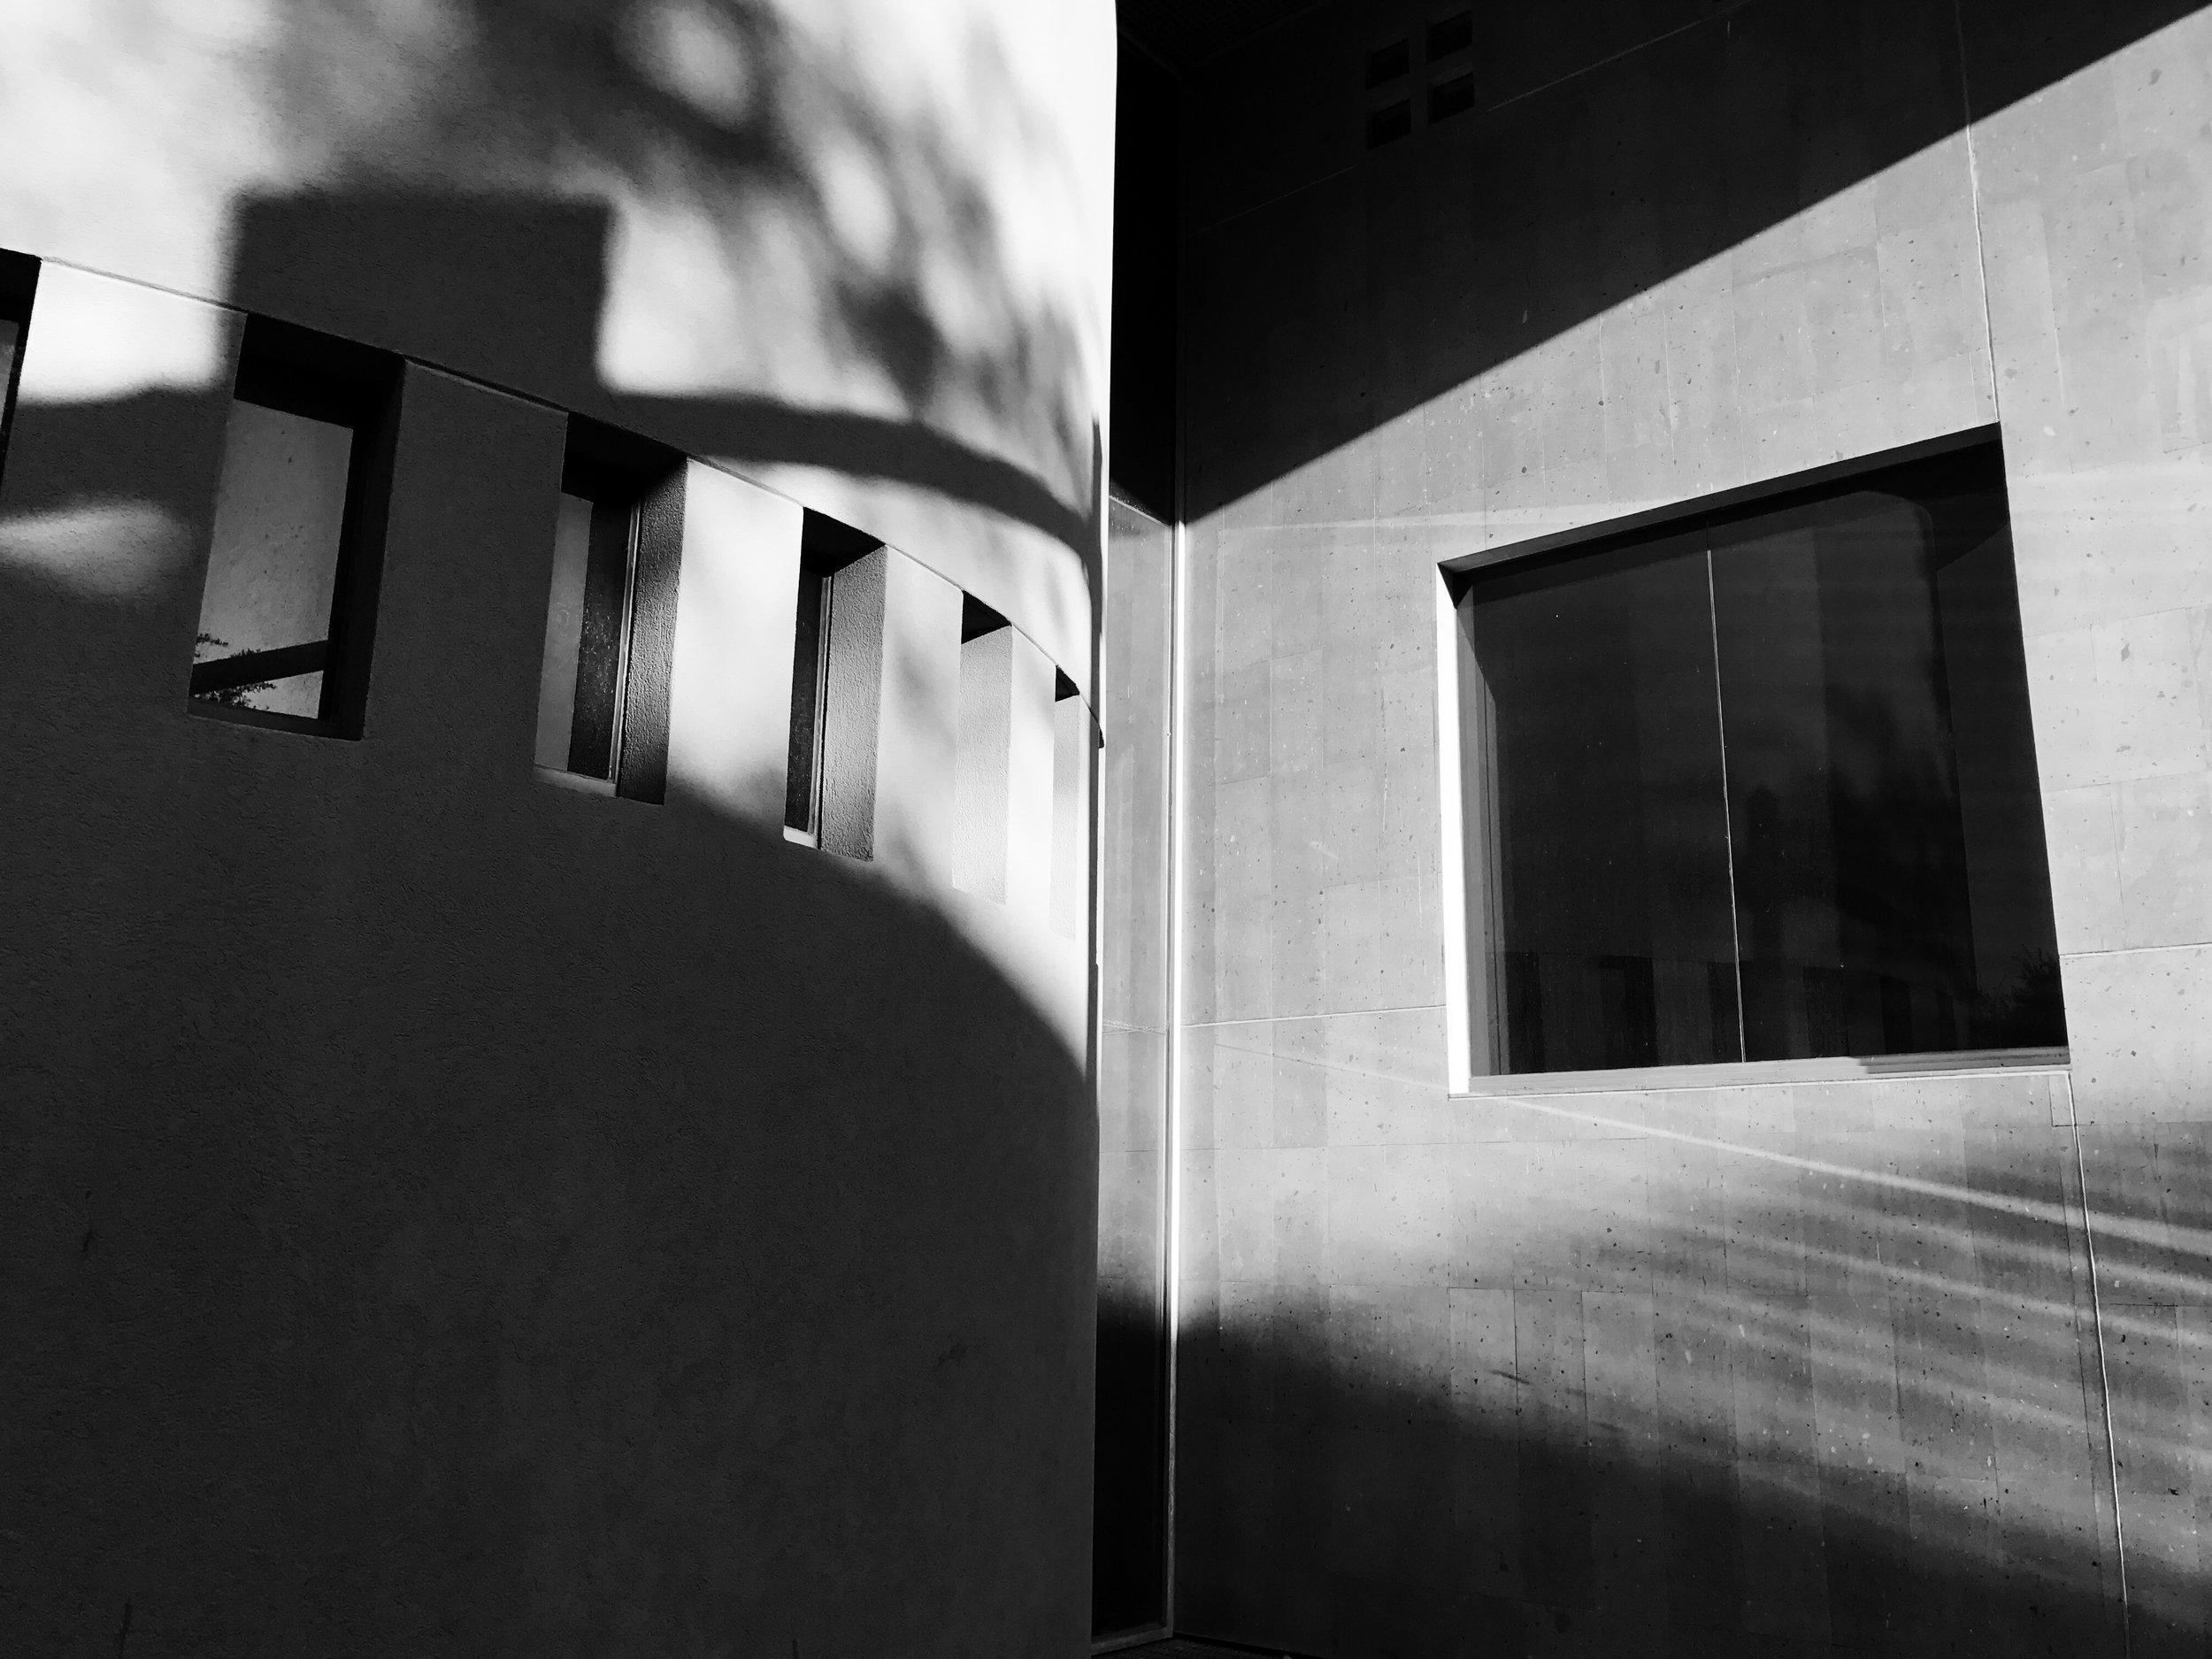 architecture_photography_fabian_villa.jpg